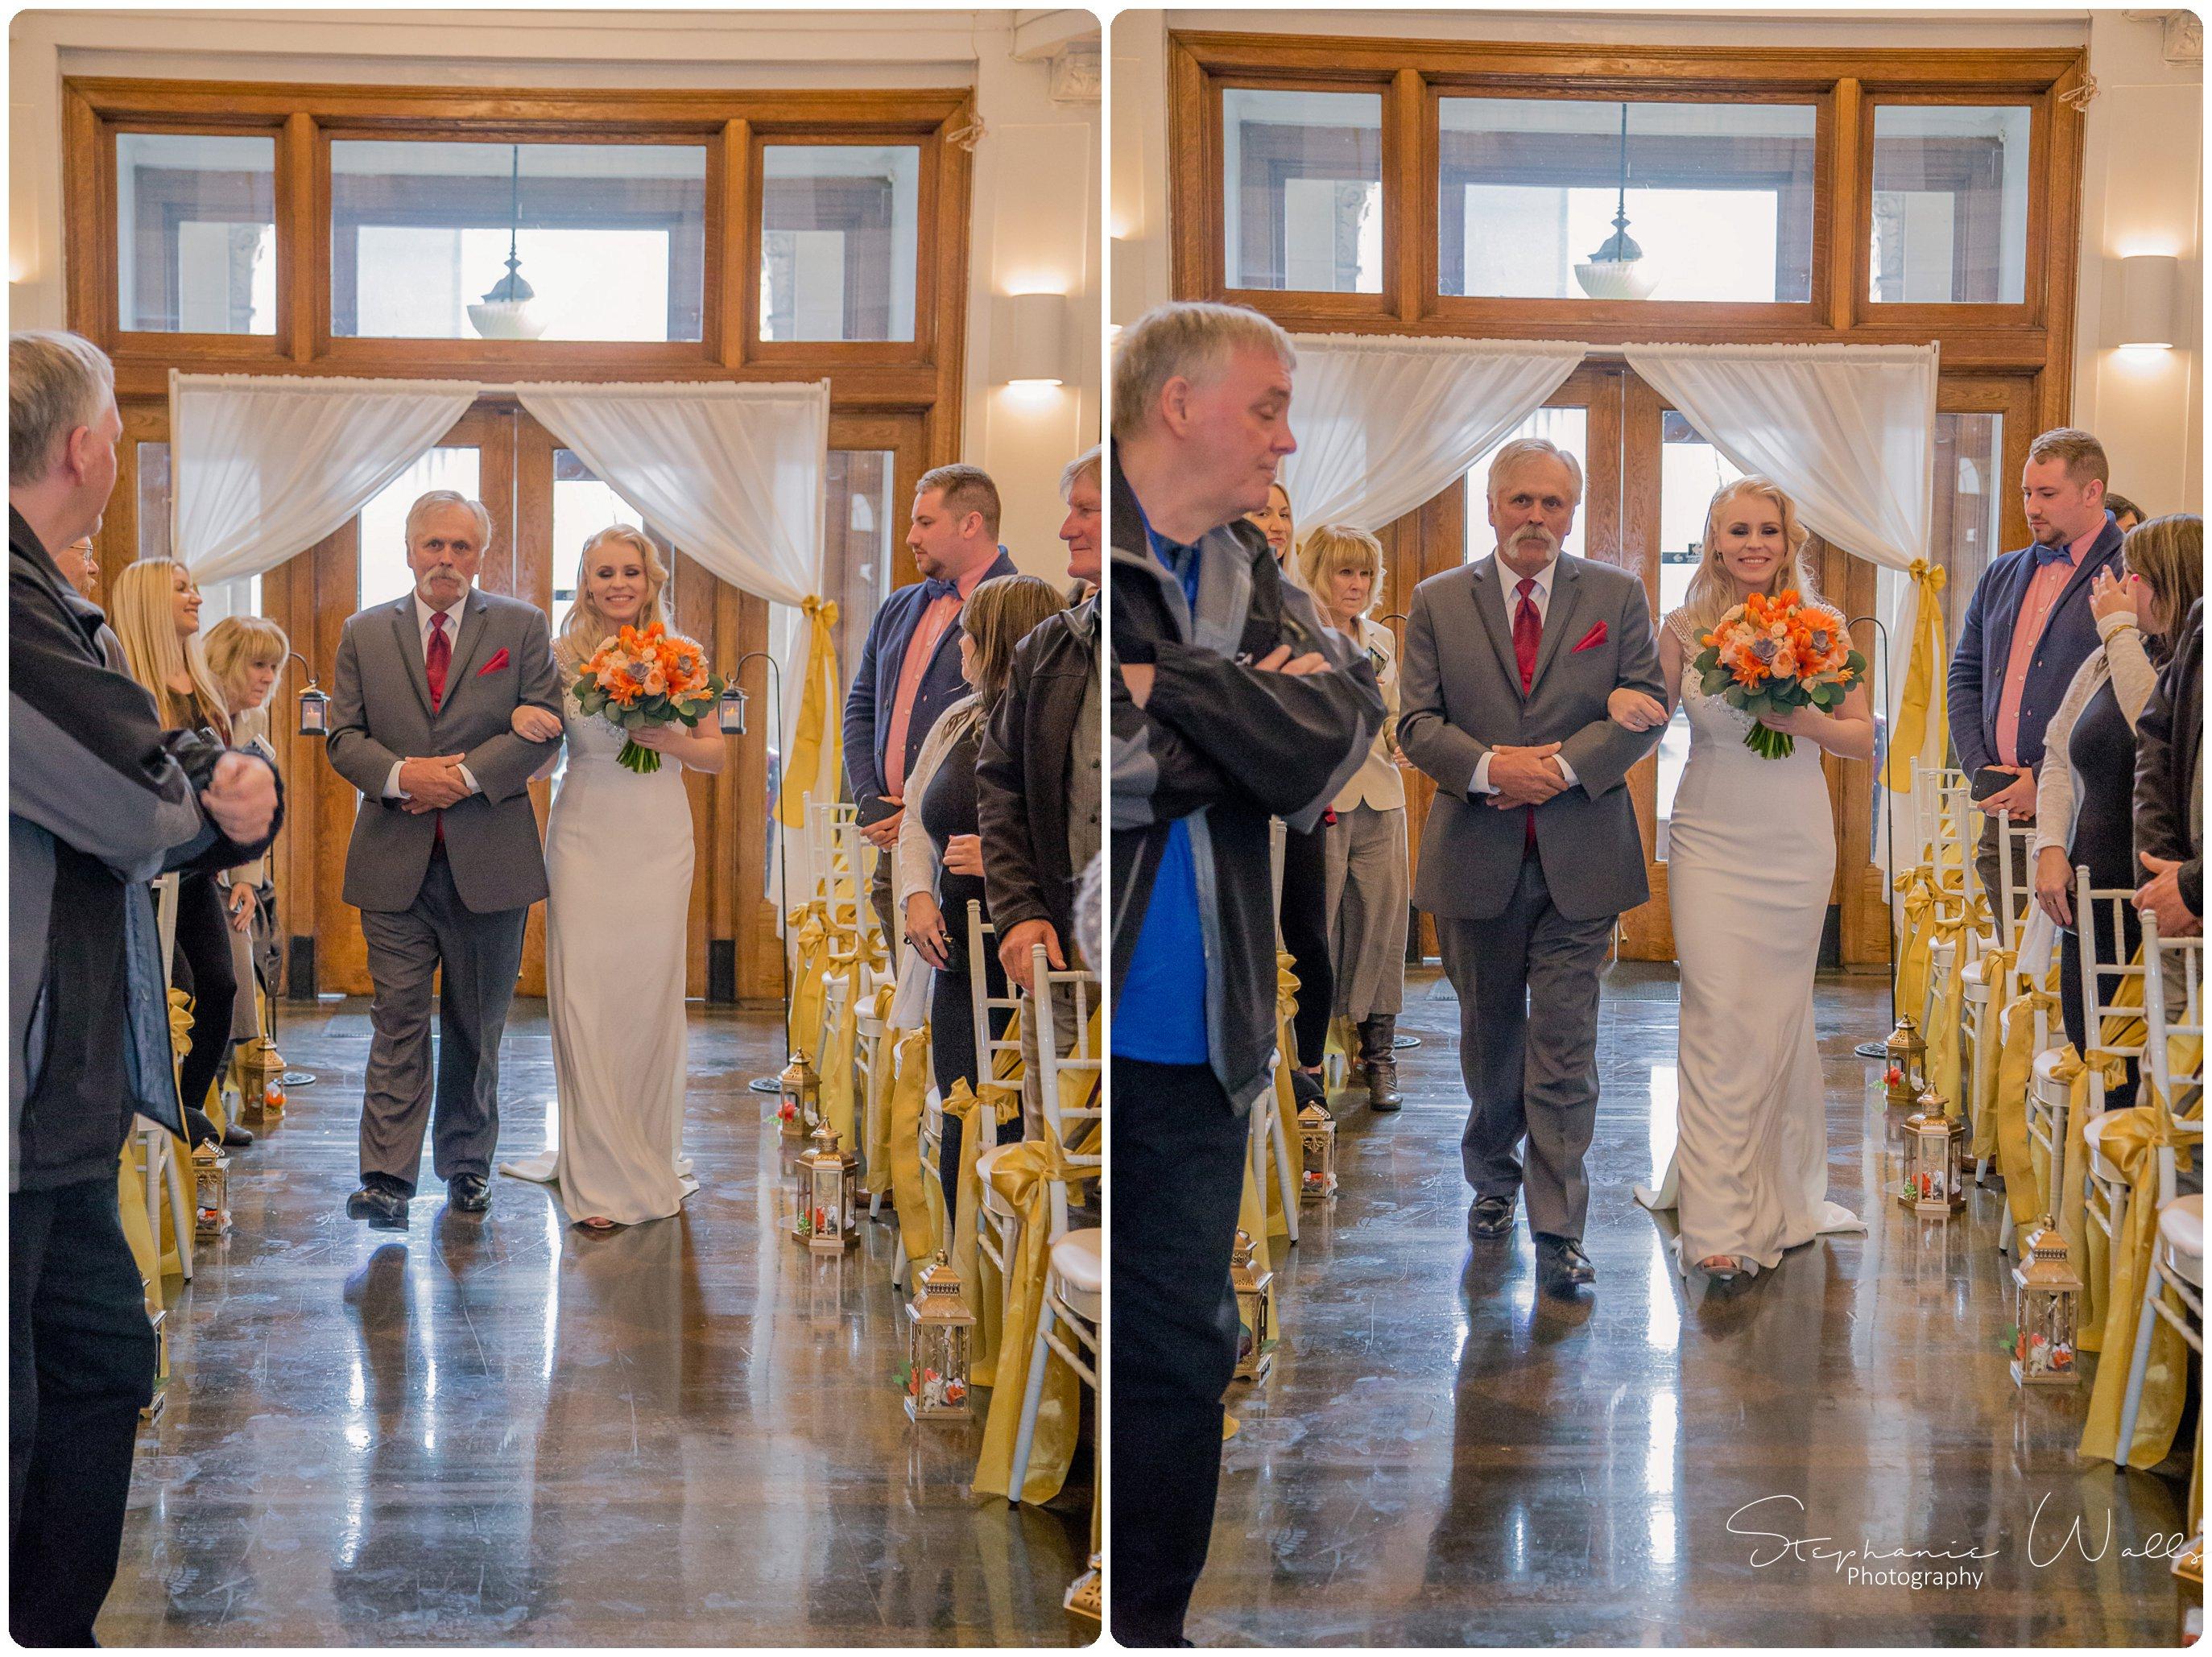 Sears Ceremony 064 The Hero & The Starlet | Monte Cristo Ballroom | Stephanie Walls Photography Weddings